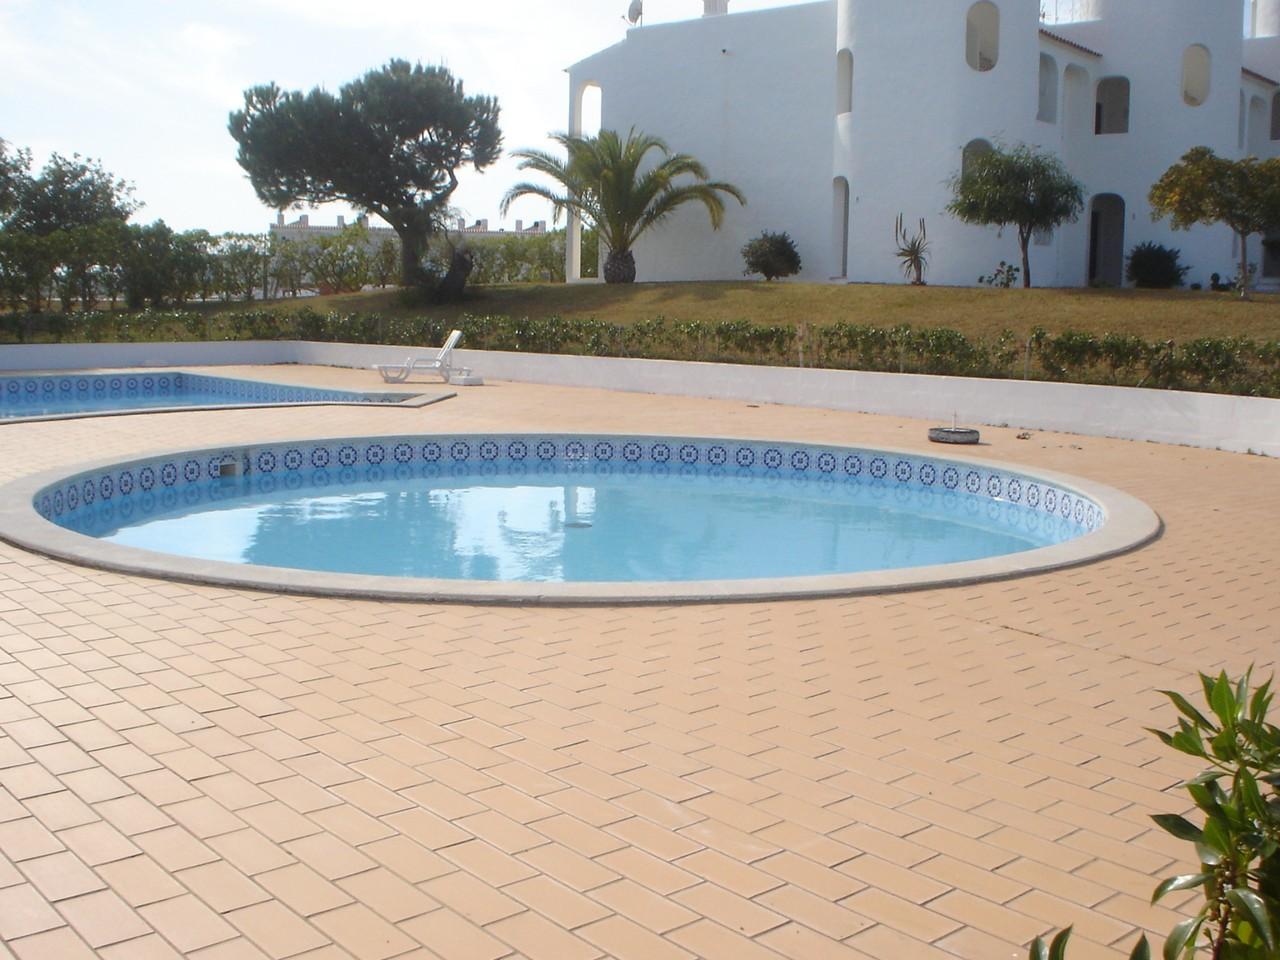 piscina pequena.jpg